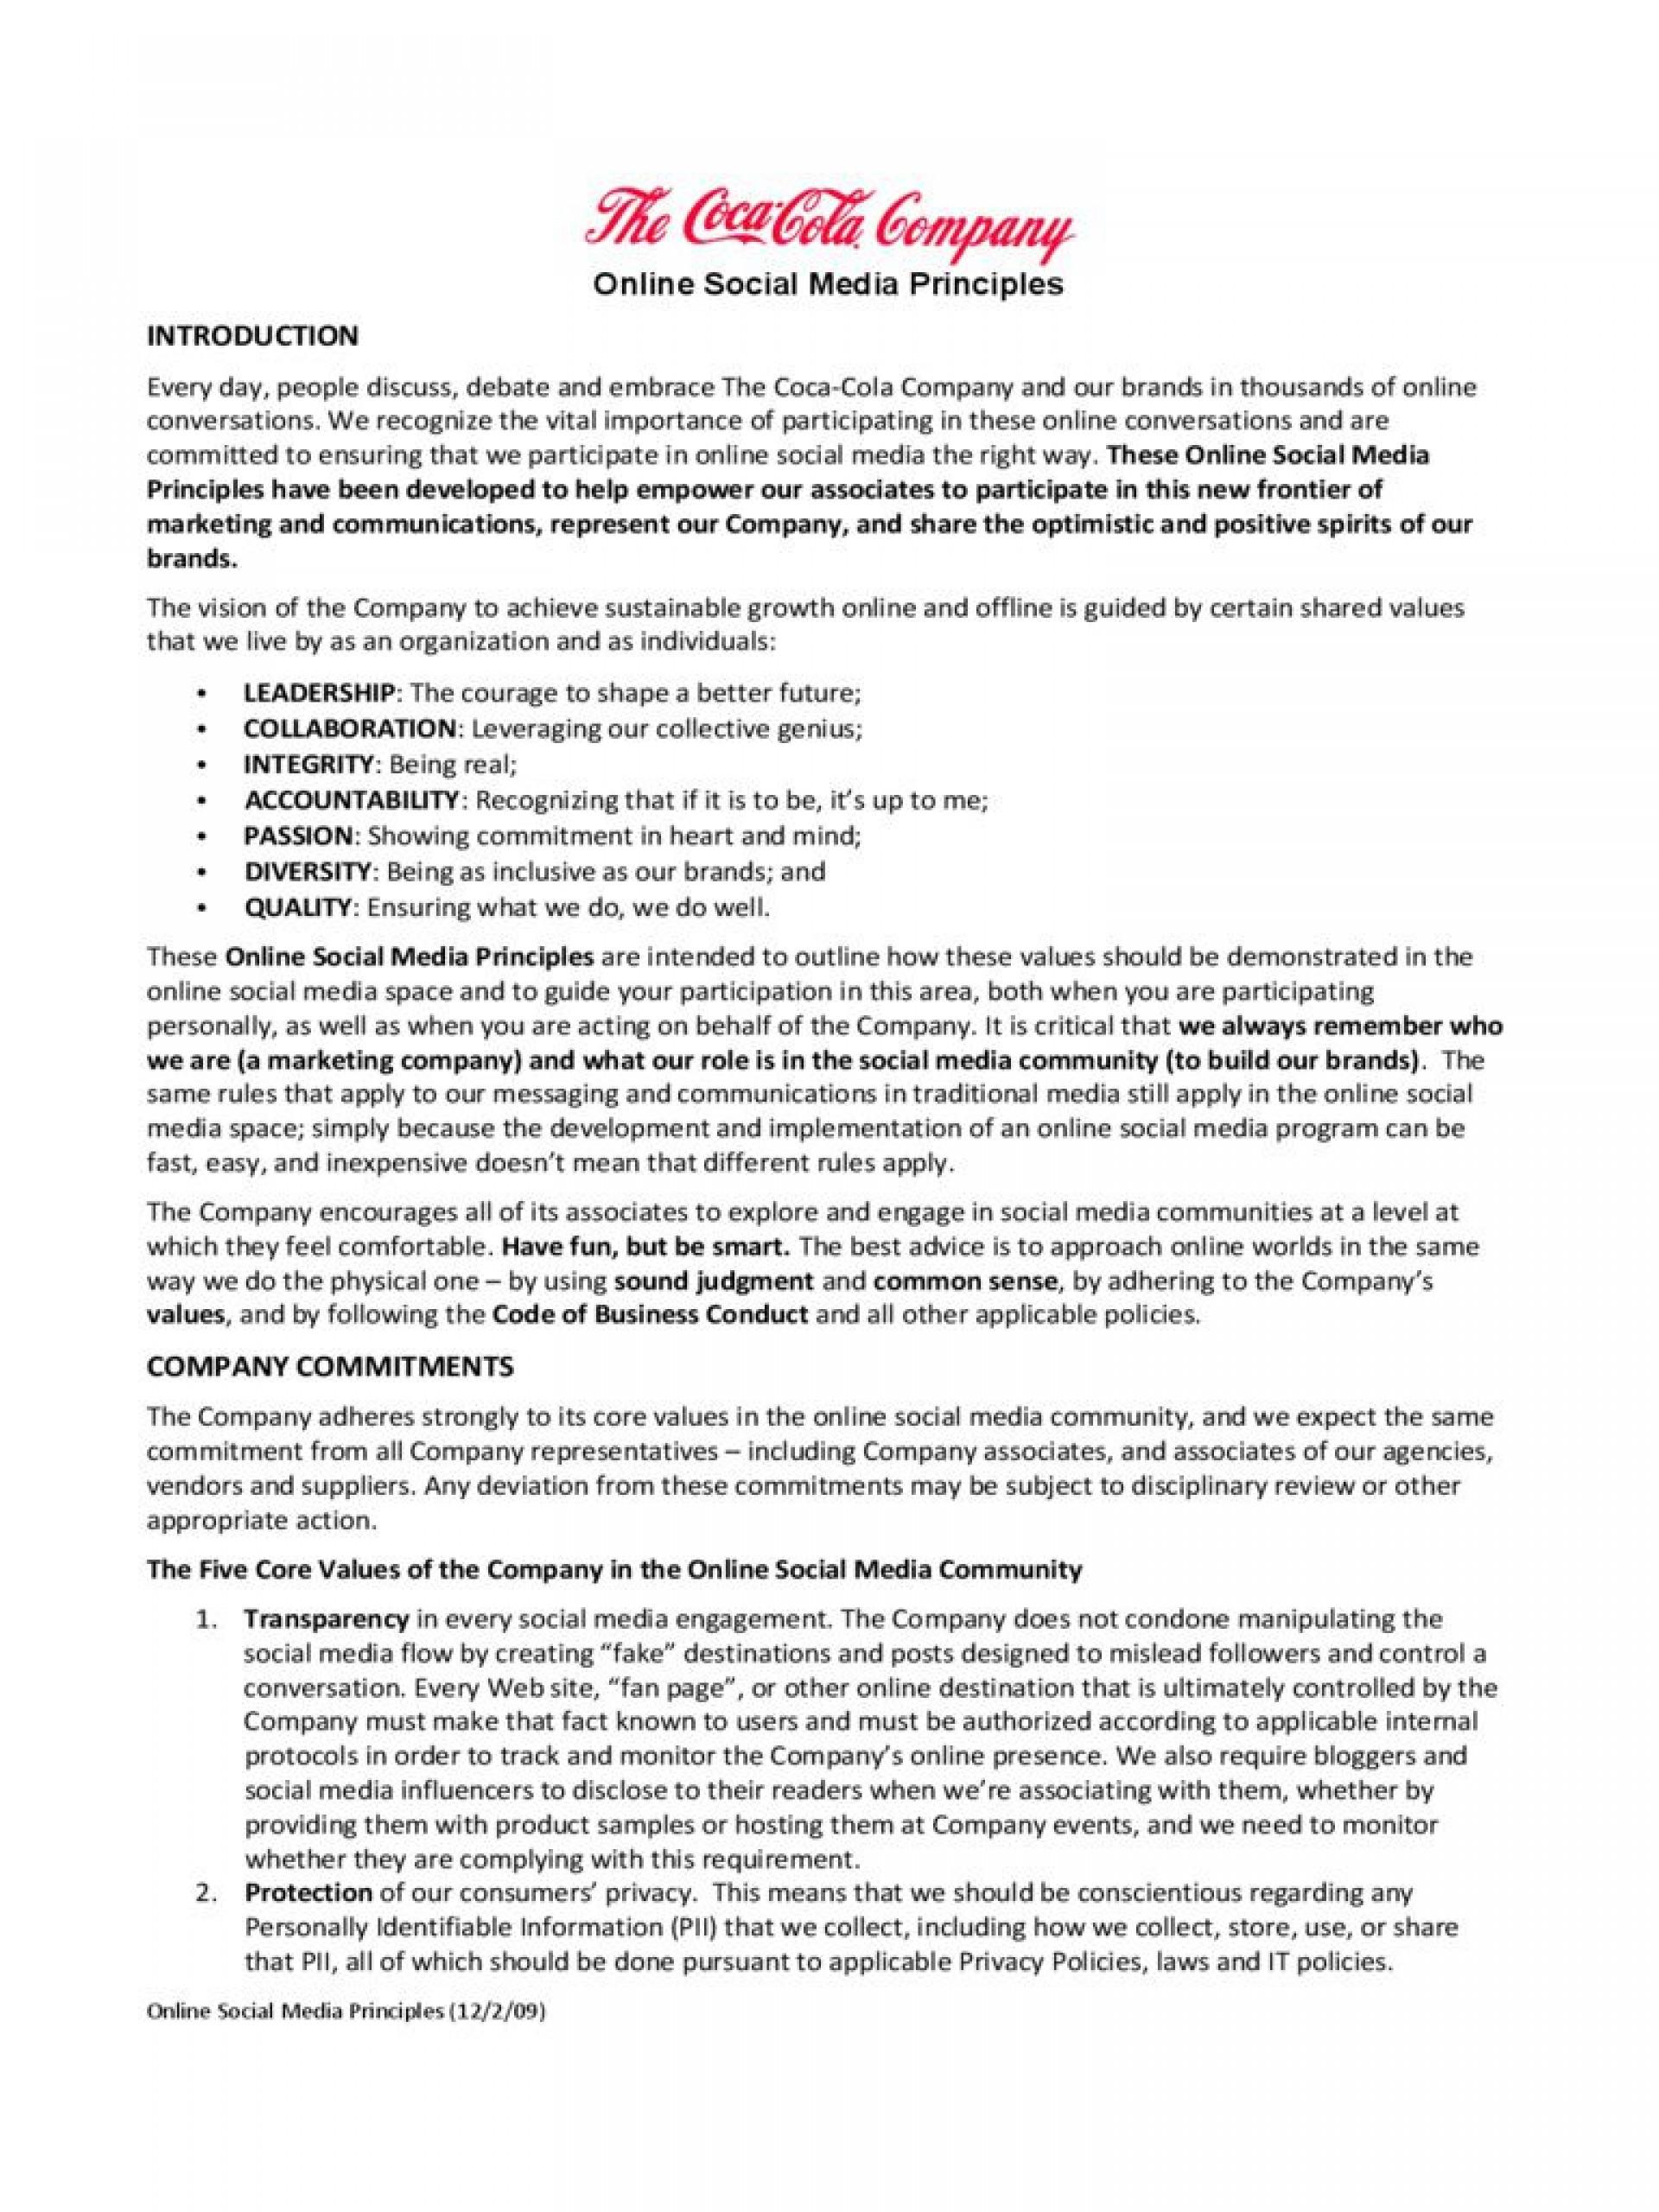 001 Sensational Social Media Policy Template Example  Nz Australia Free Uk1920